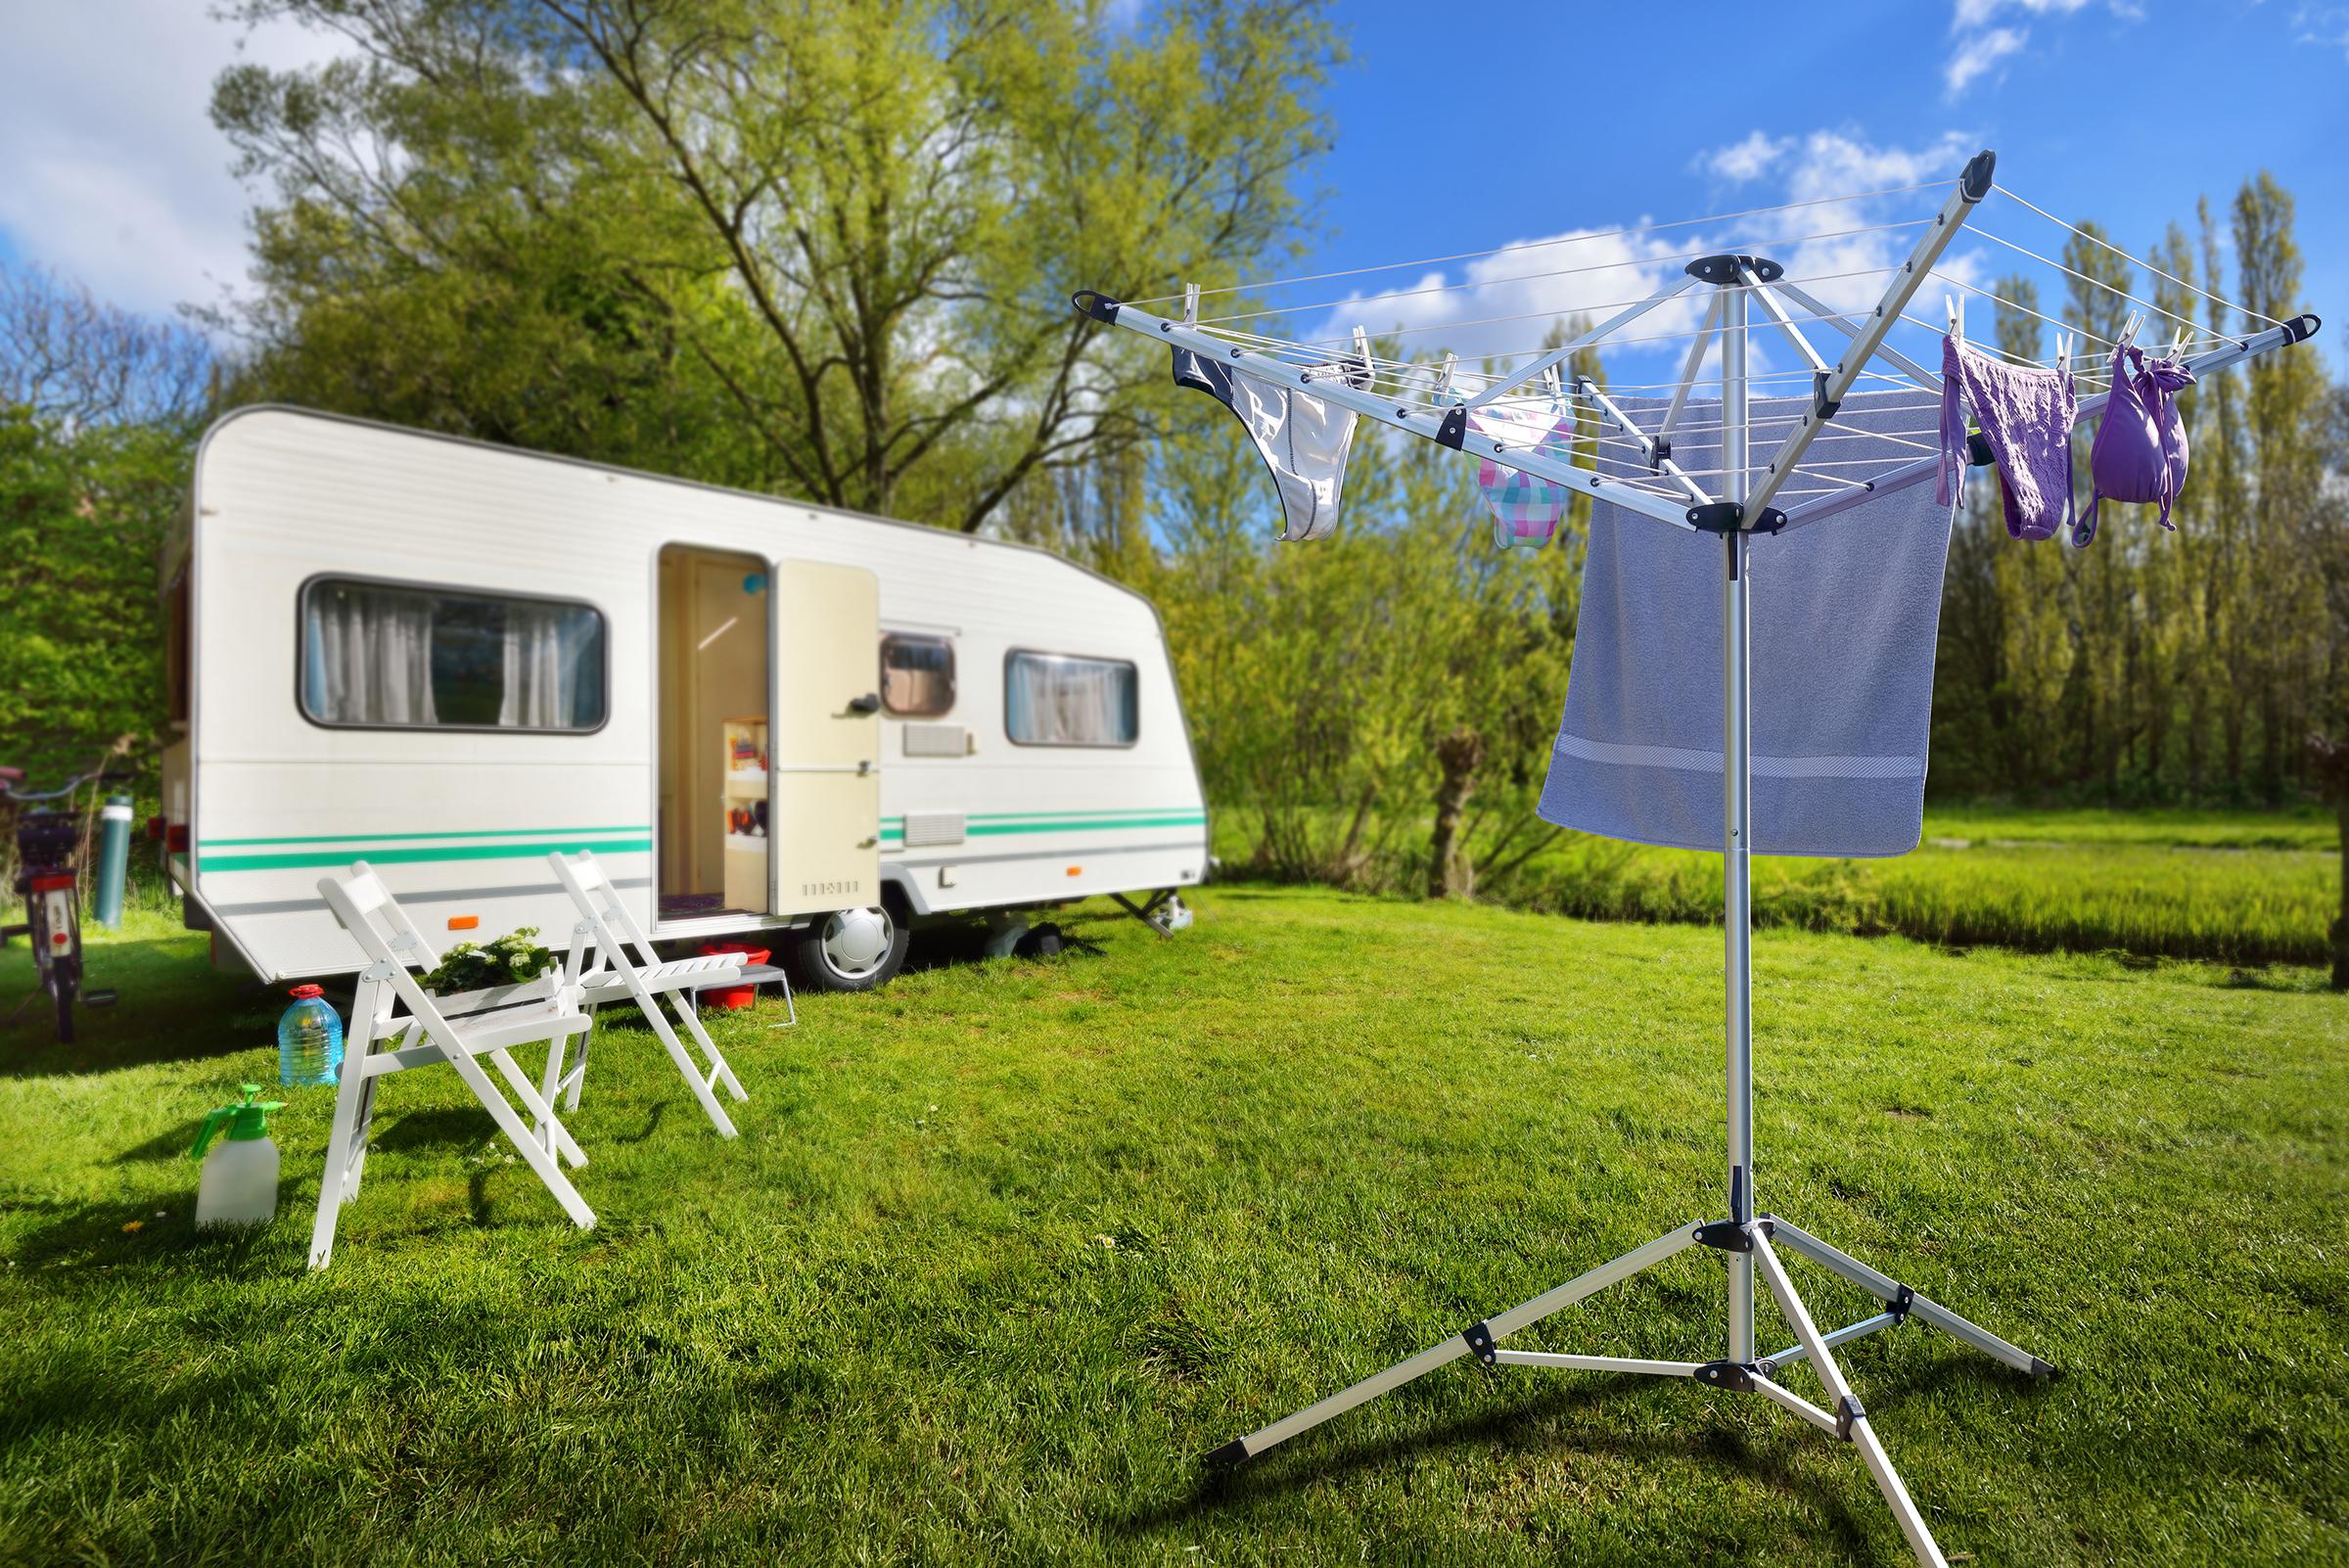 FreeAir Camping-Wäschespinne